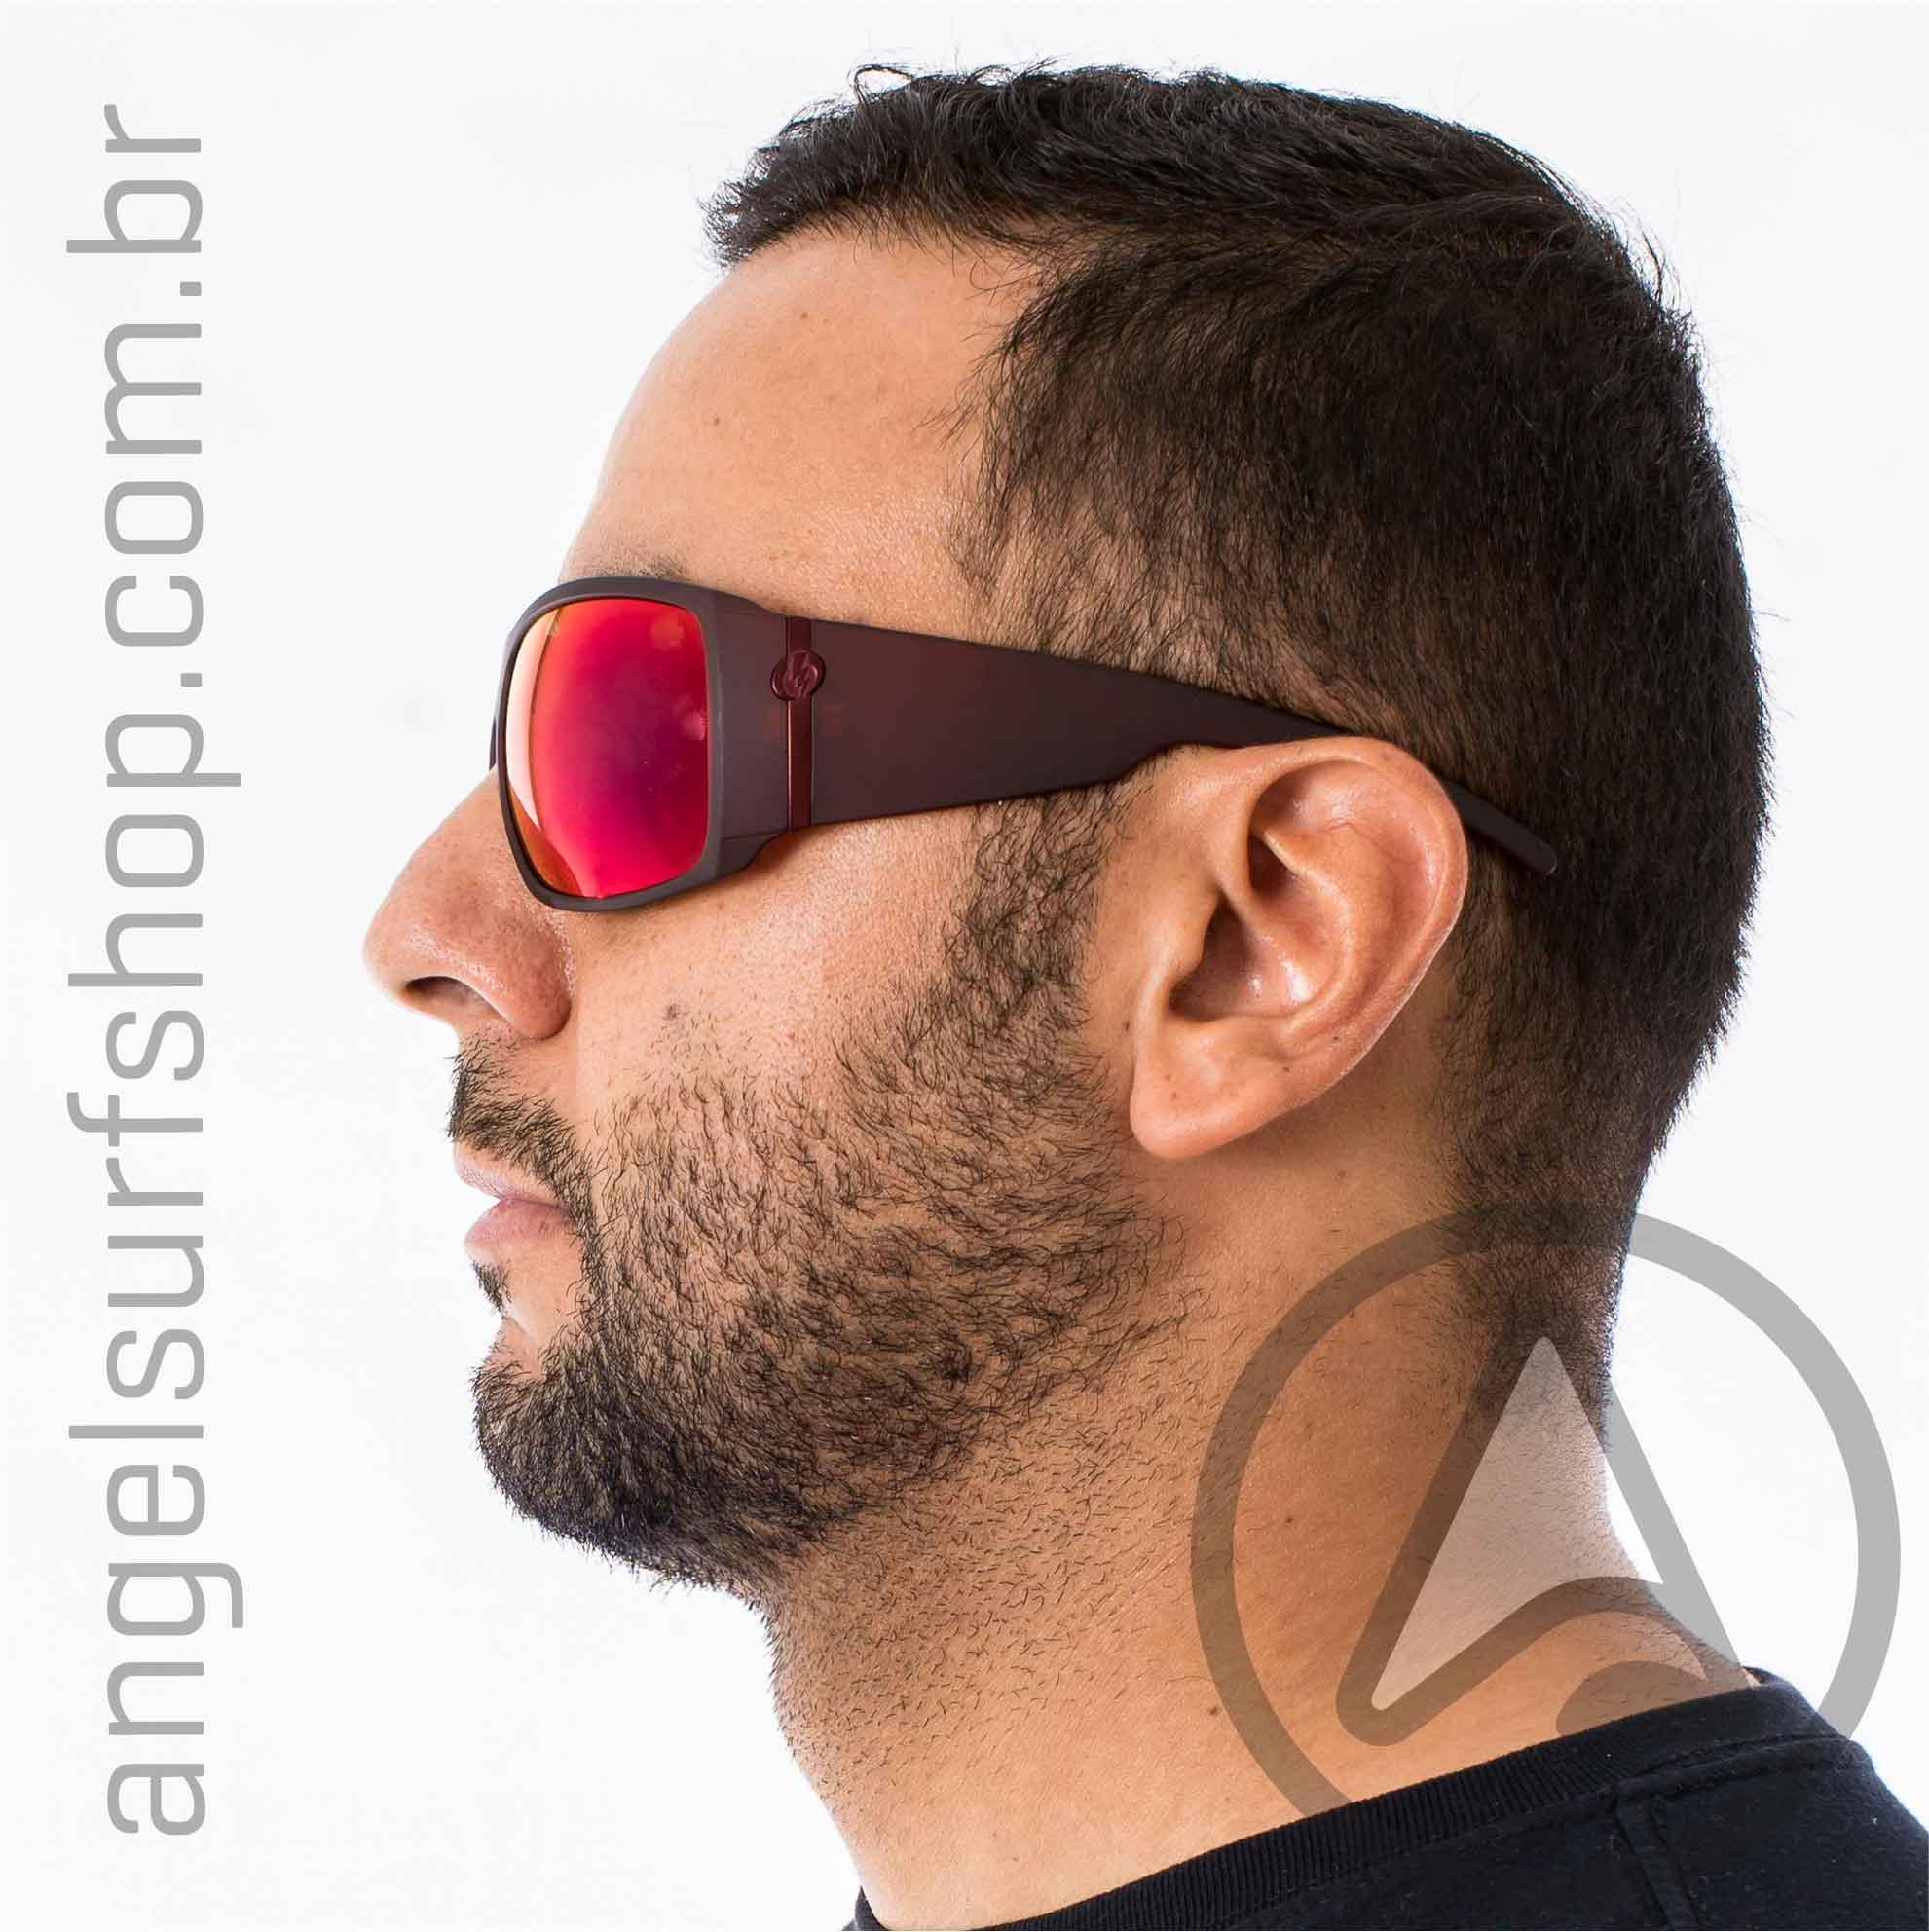 Sunglass Electric Big Beat Plasma Gry Plasma Chrome